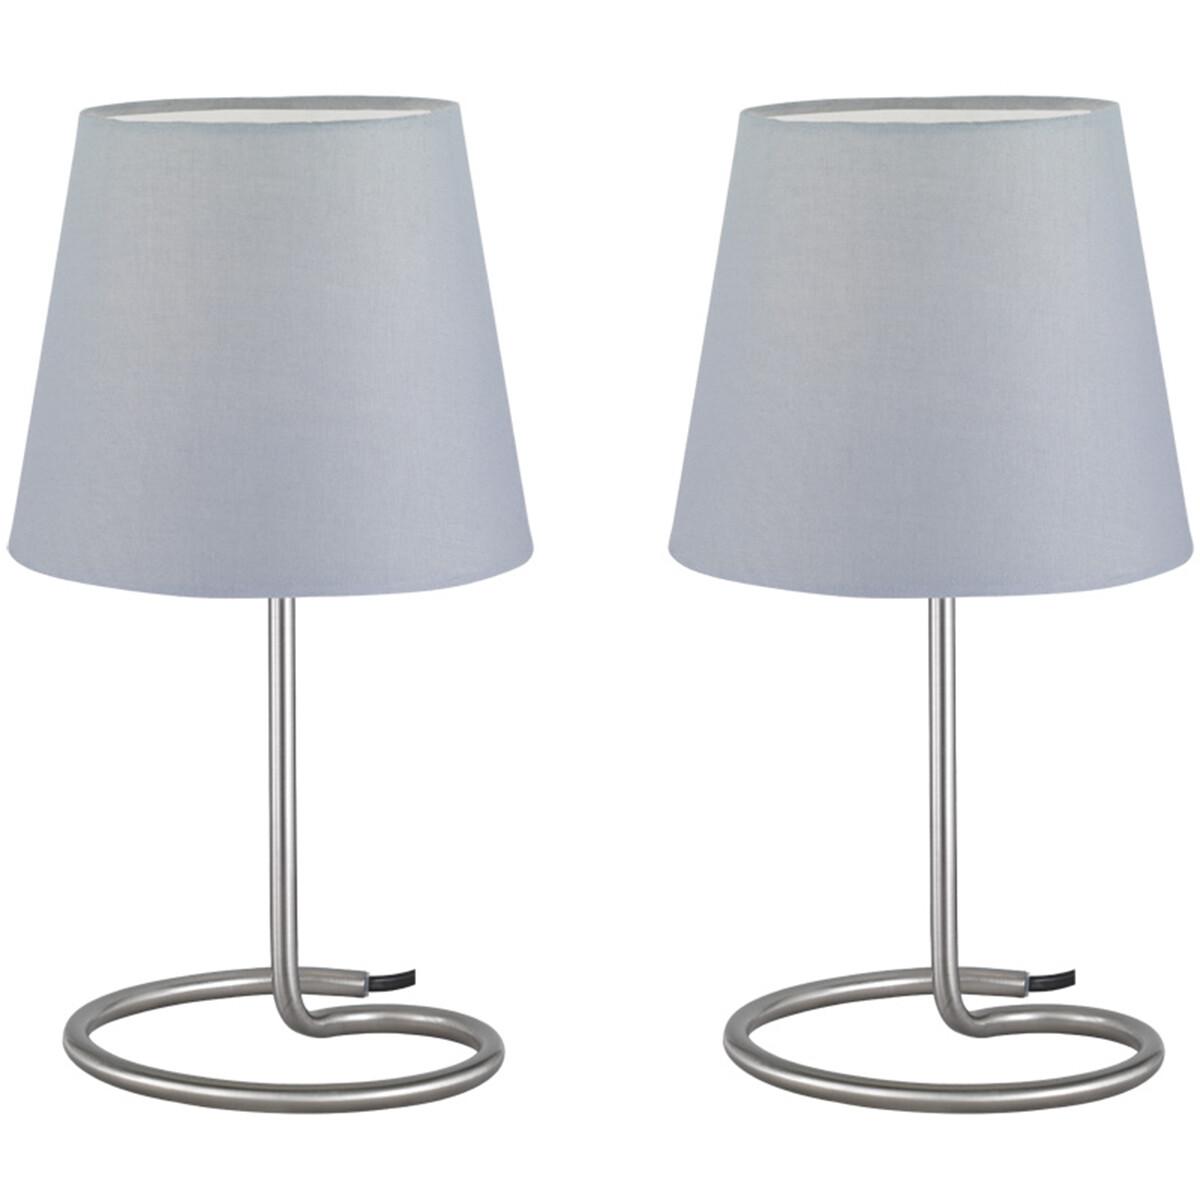 LED Tafellamp 2 Pack - Tafelverlichting - Trion Twinko - E14 Fitting - Rond - Mat Grijs - Aluminium